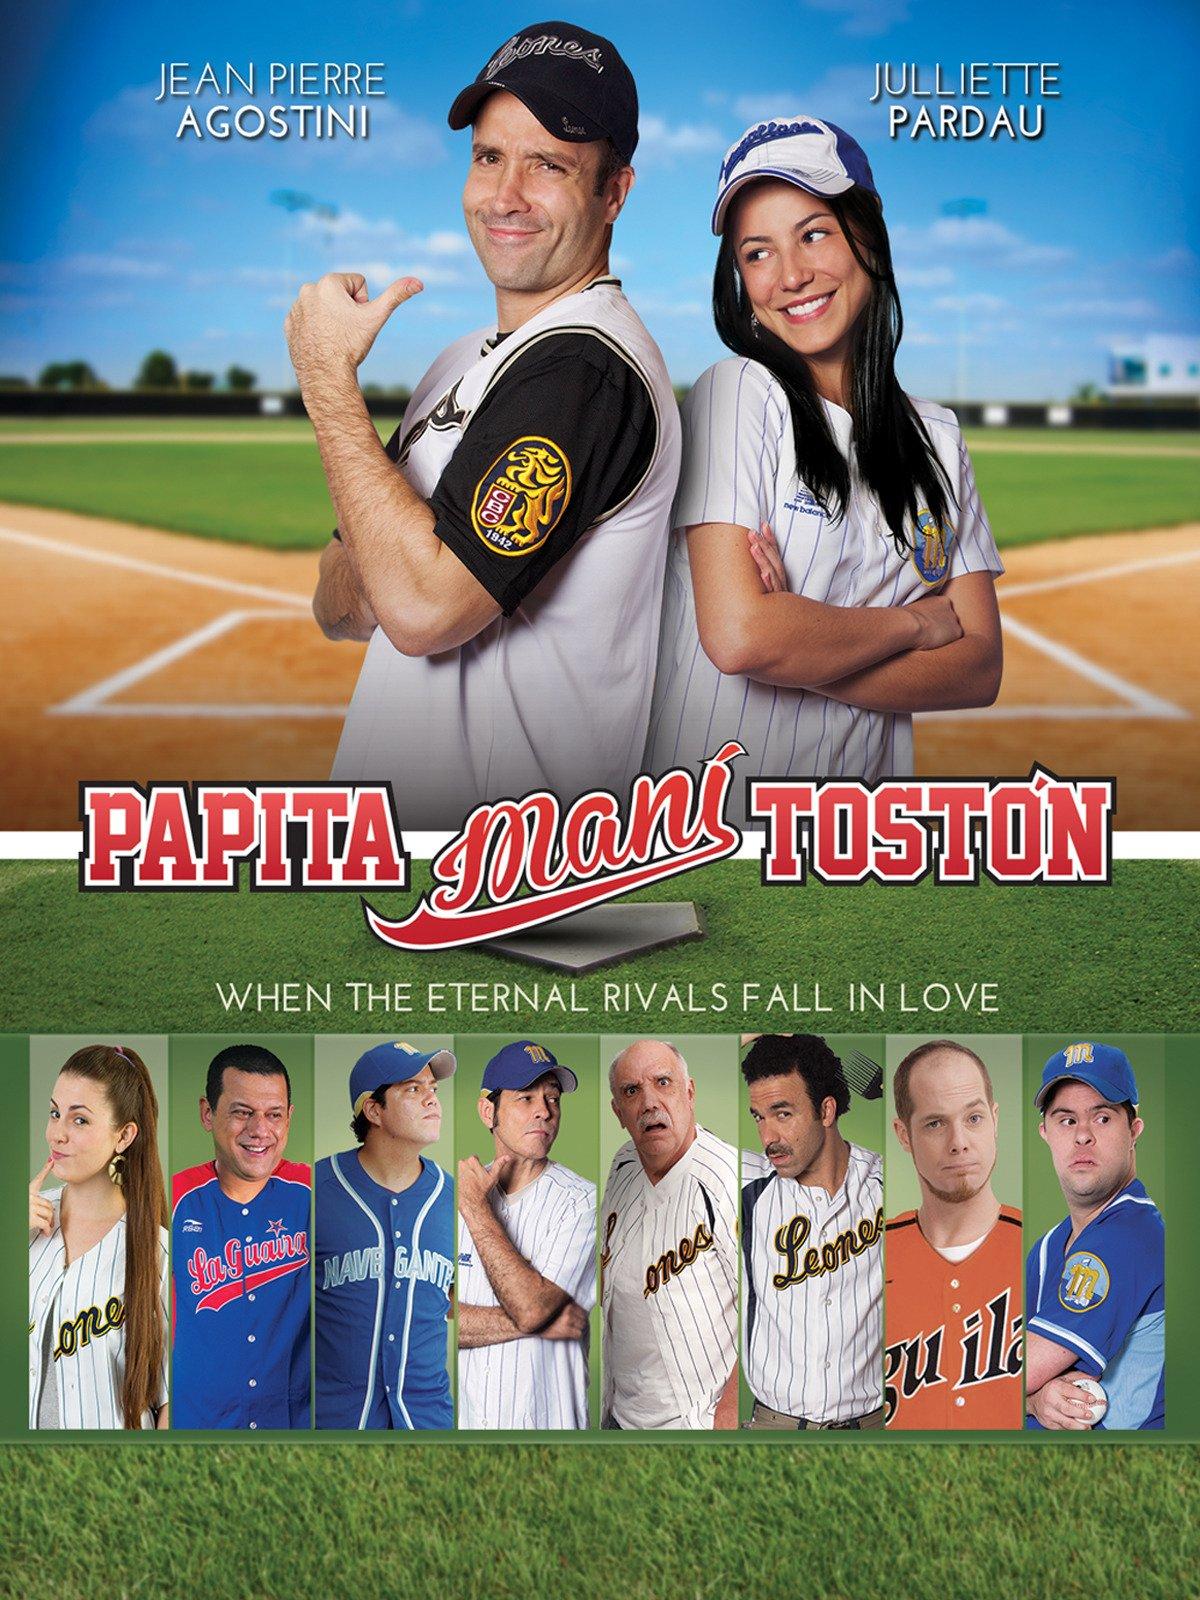 Watch Papita Mani Toston Prime Video